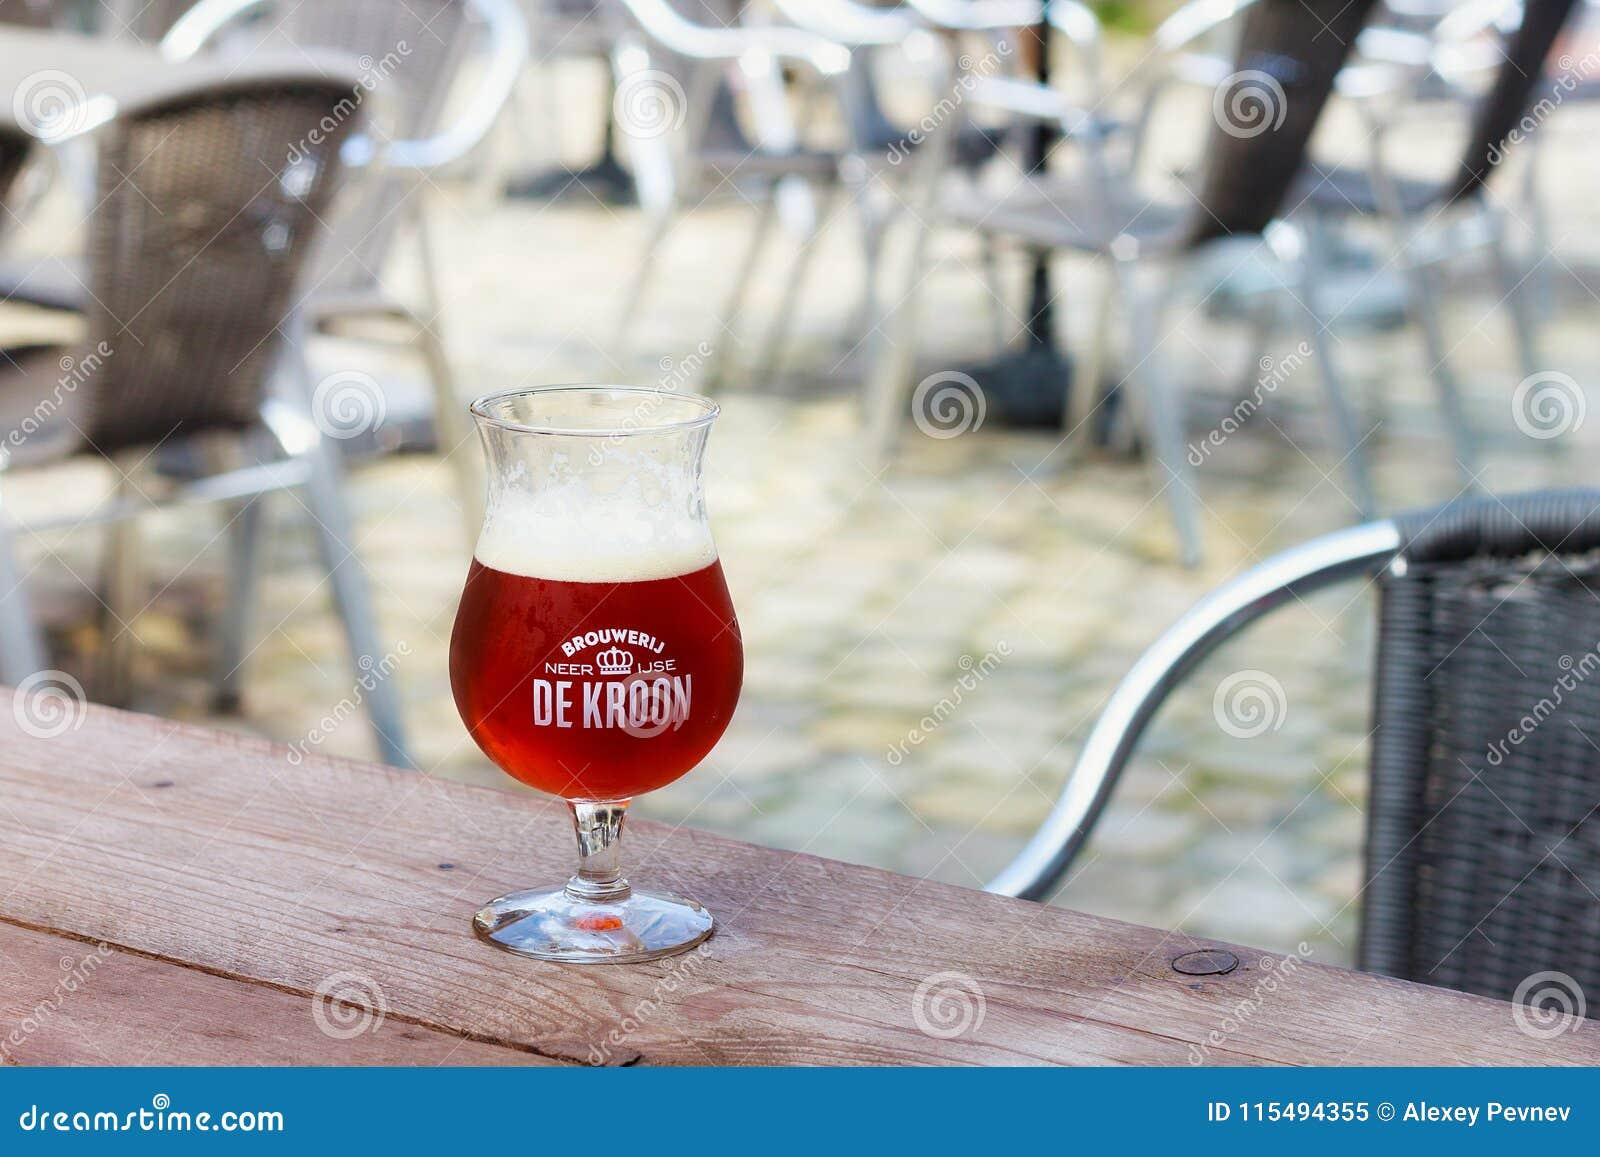 NEERIJSE,比利时- 2014年9月05日:品尝原始的啤酒